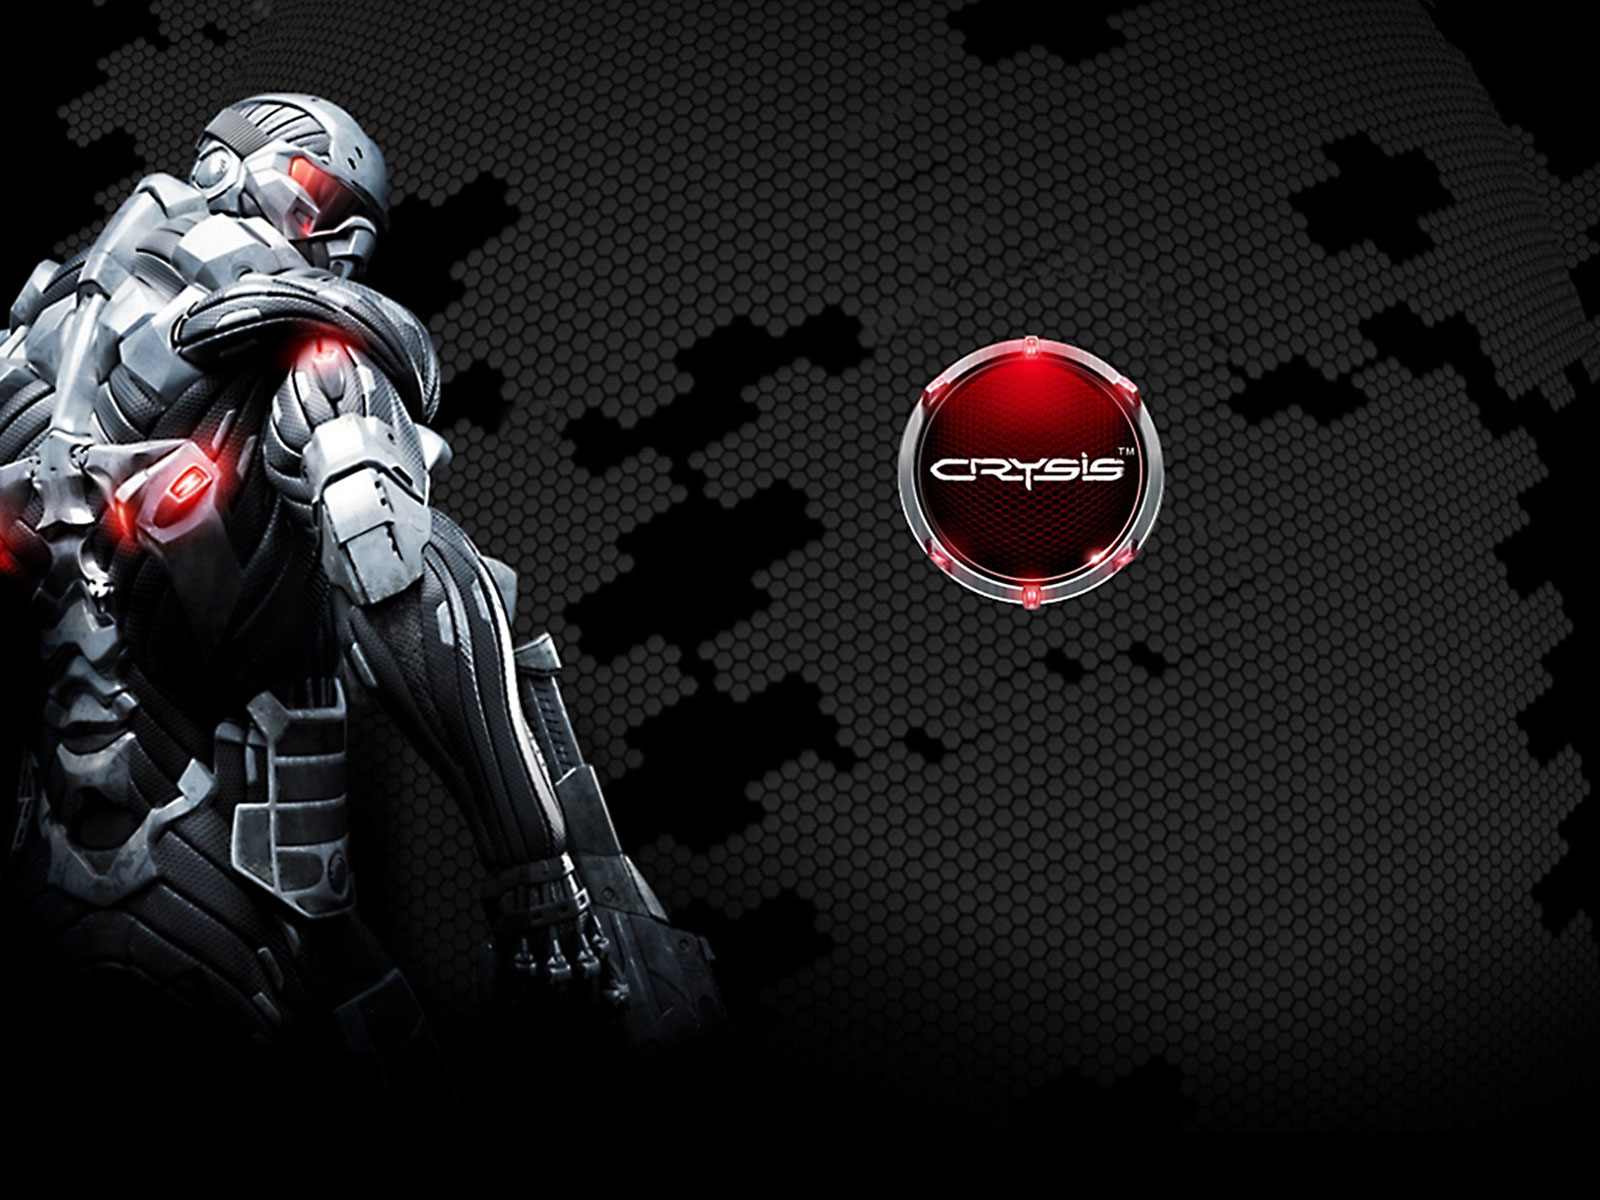 Crysis Wallpaper Themes